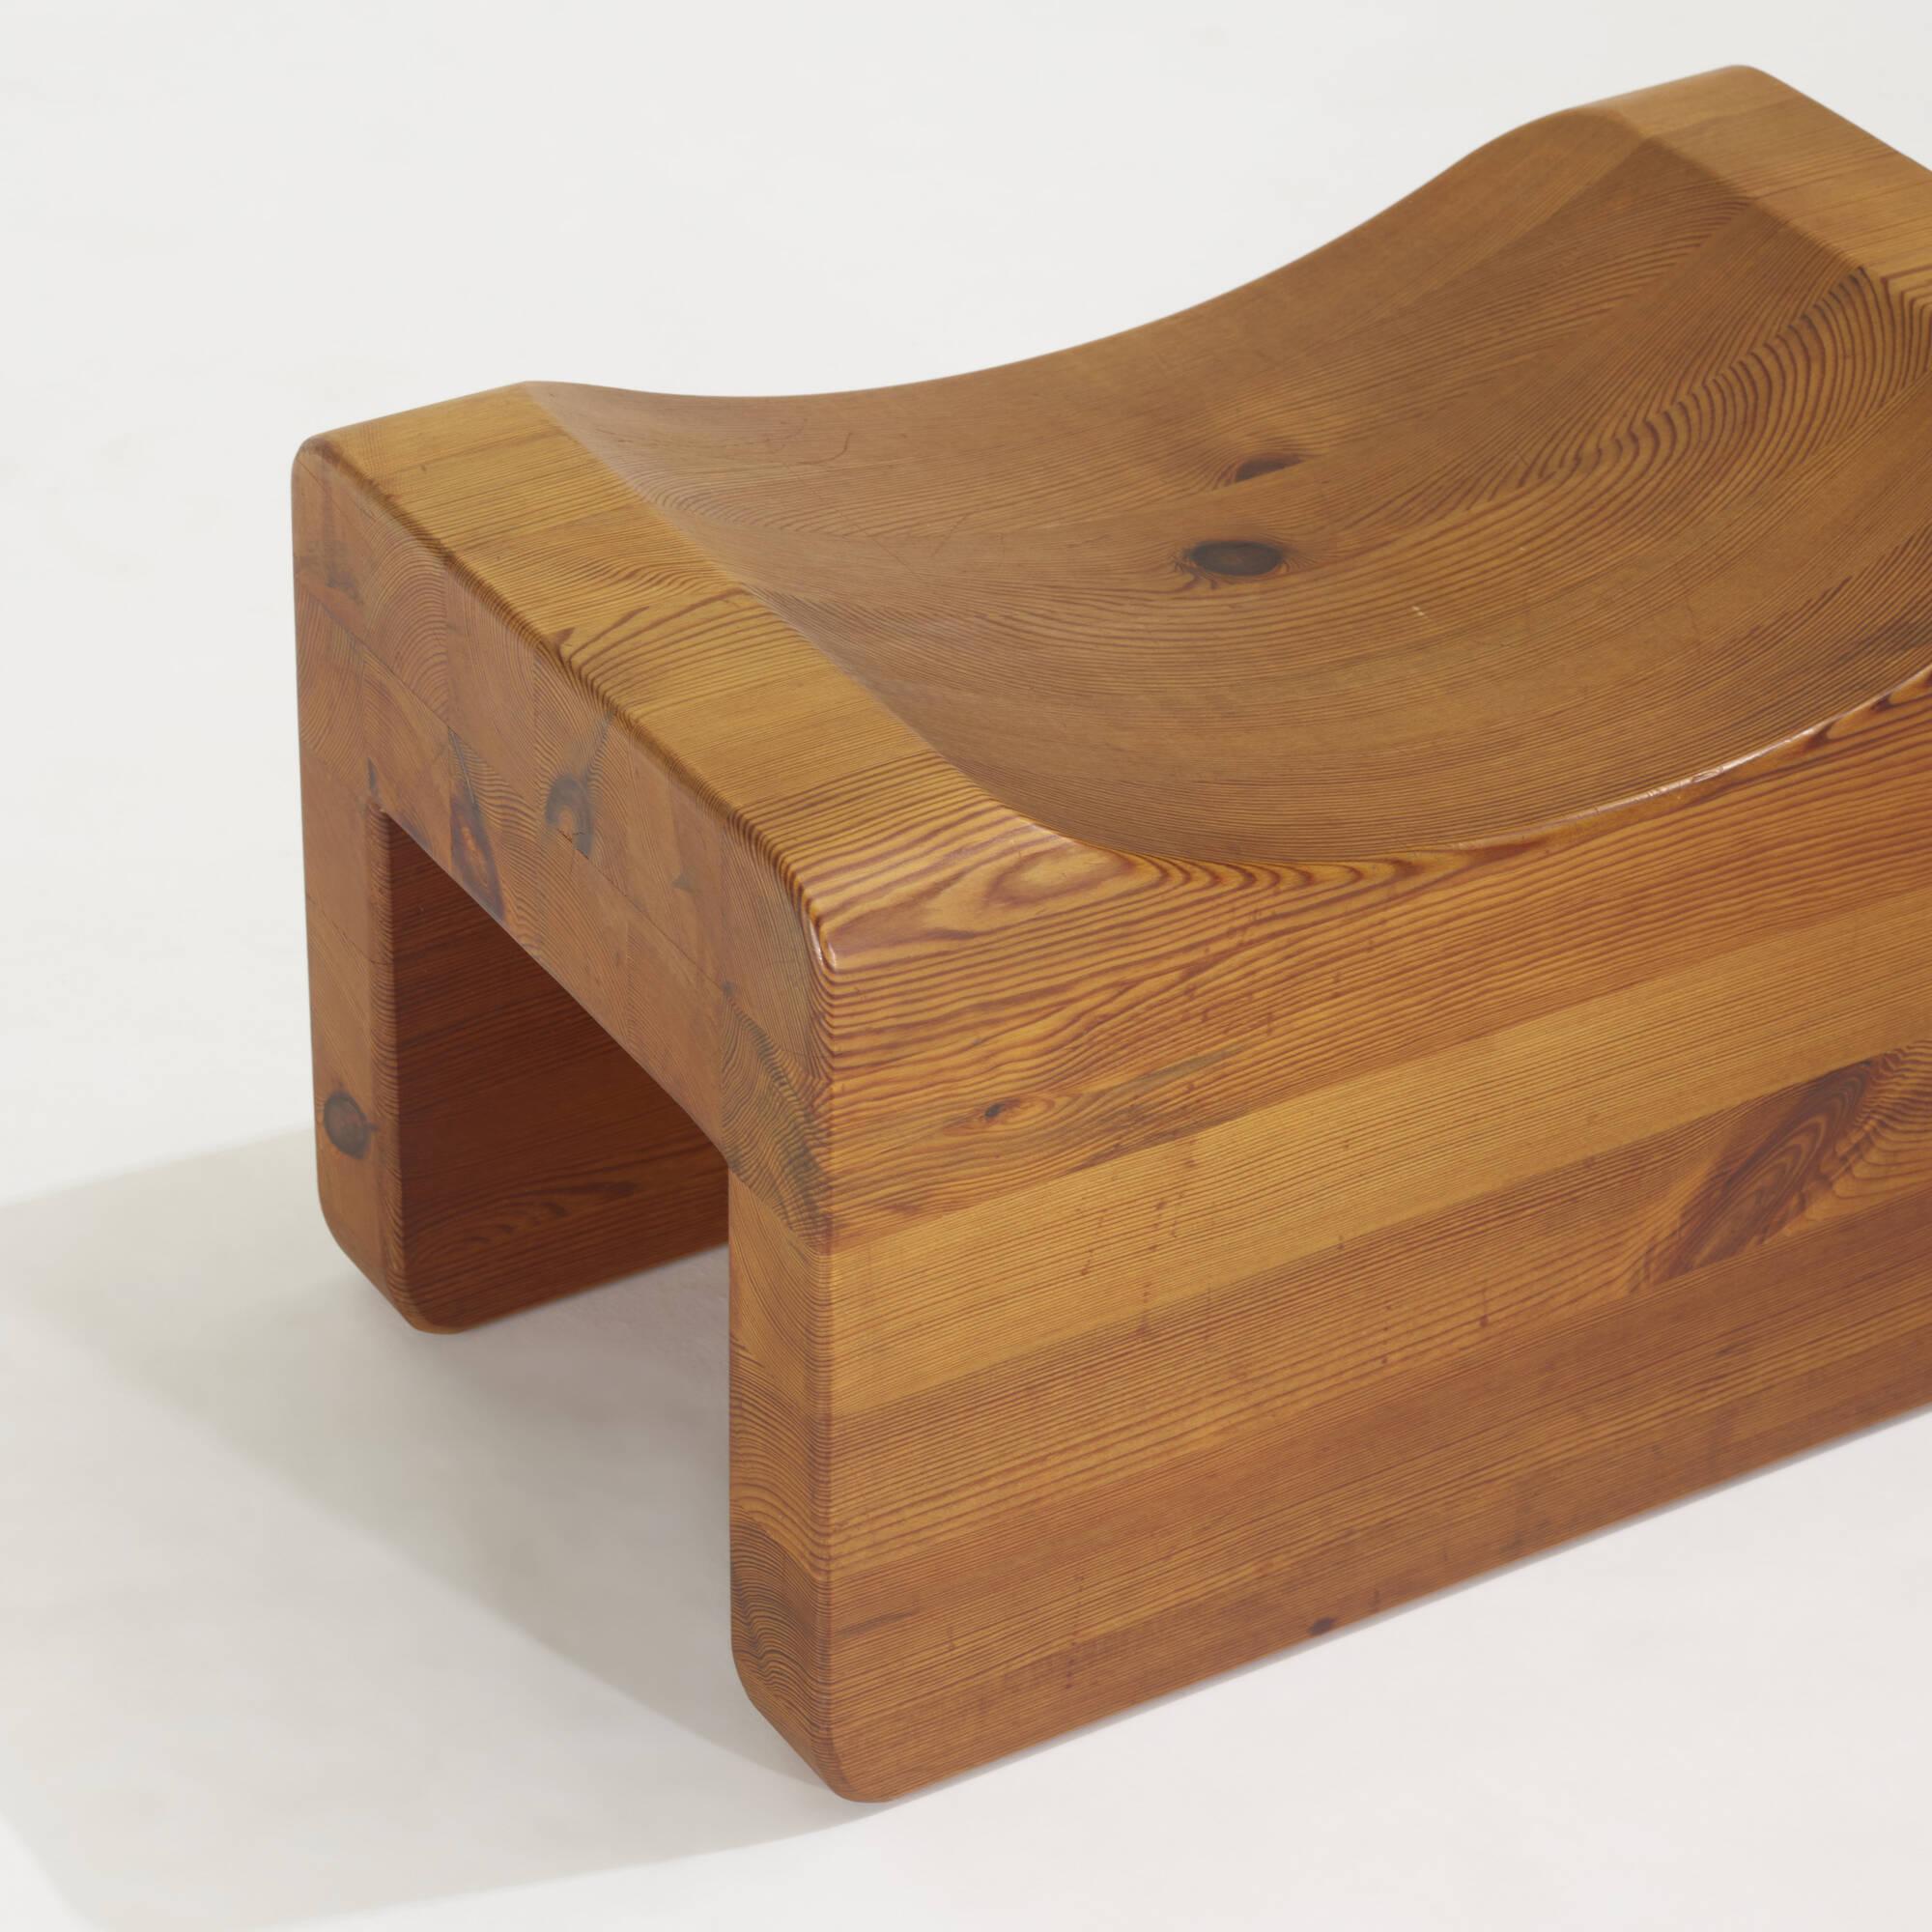 264: Axel Einar Hjorth / Uto stool (2 of 2)